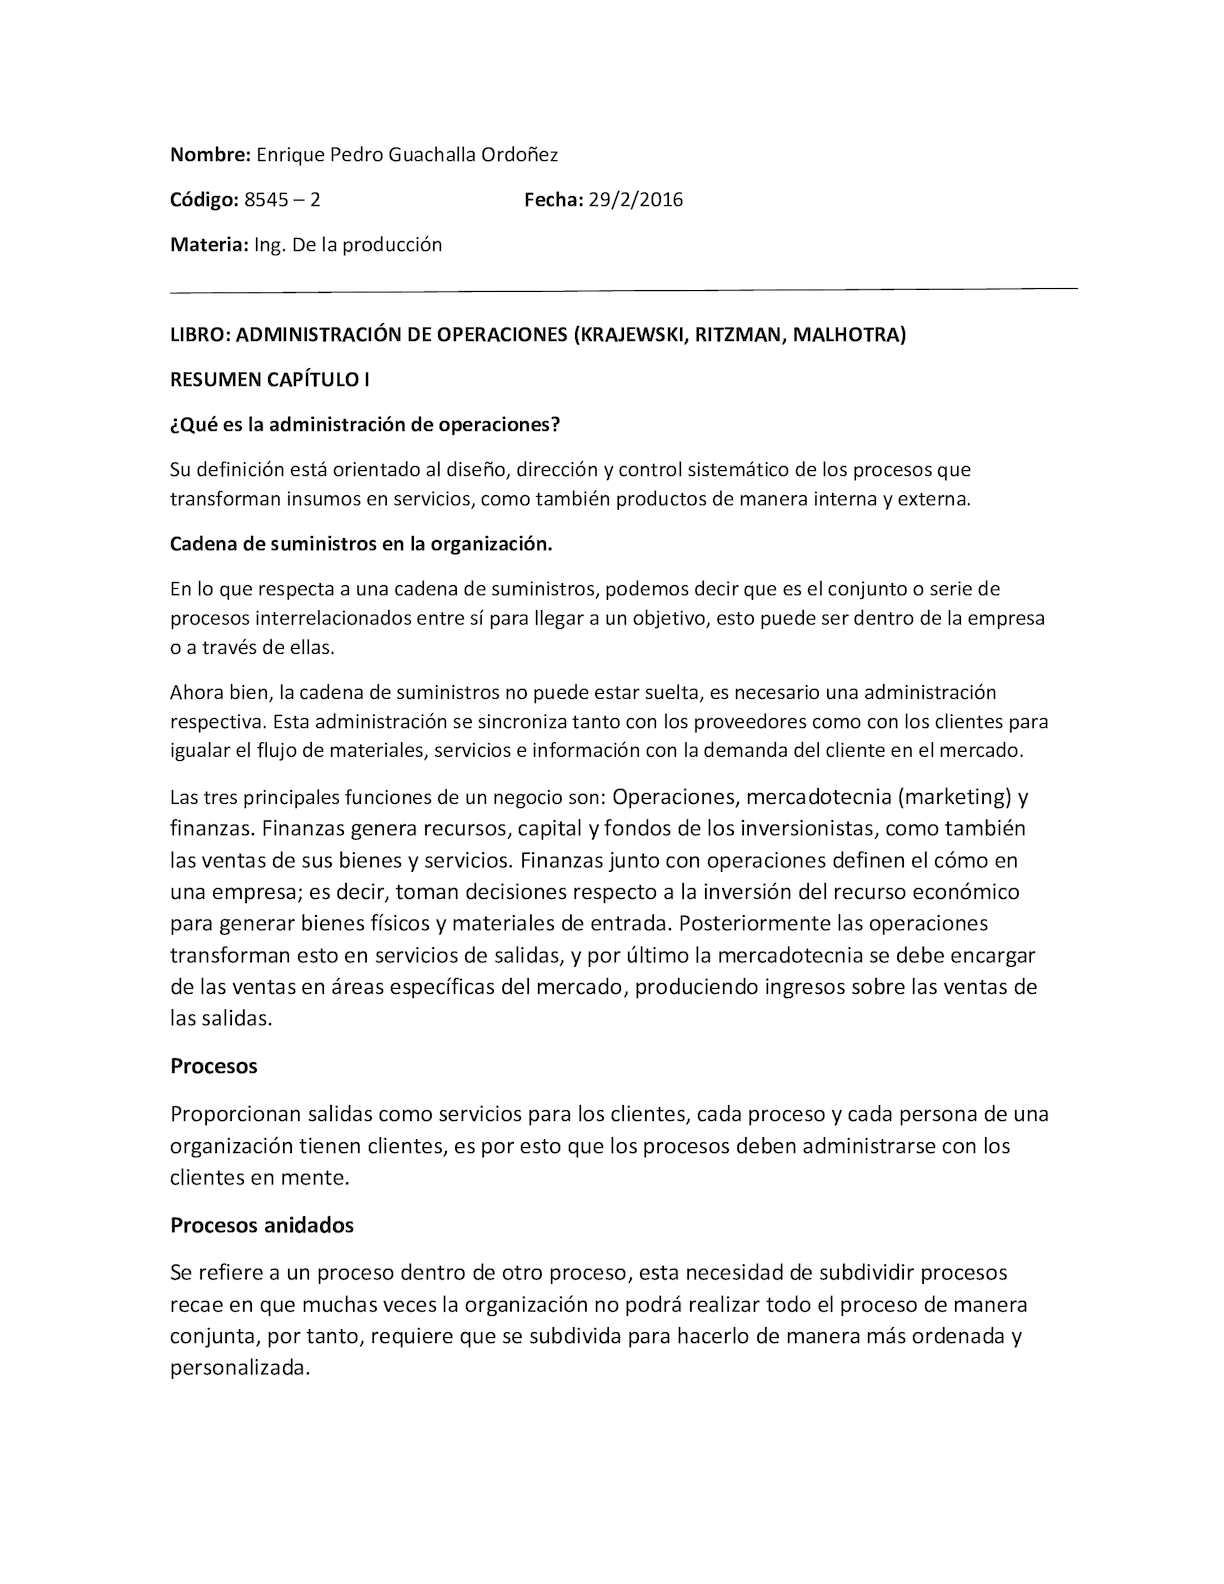 Calaméo - ADMINISTRACION DE OPERACIONES - RESUMEN CAPITULO I